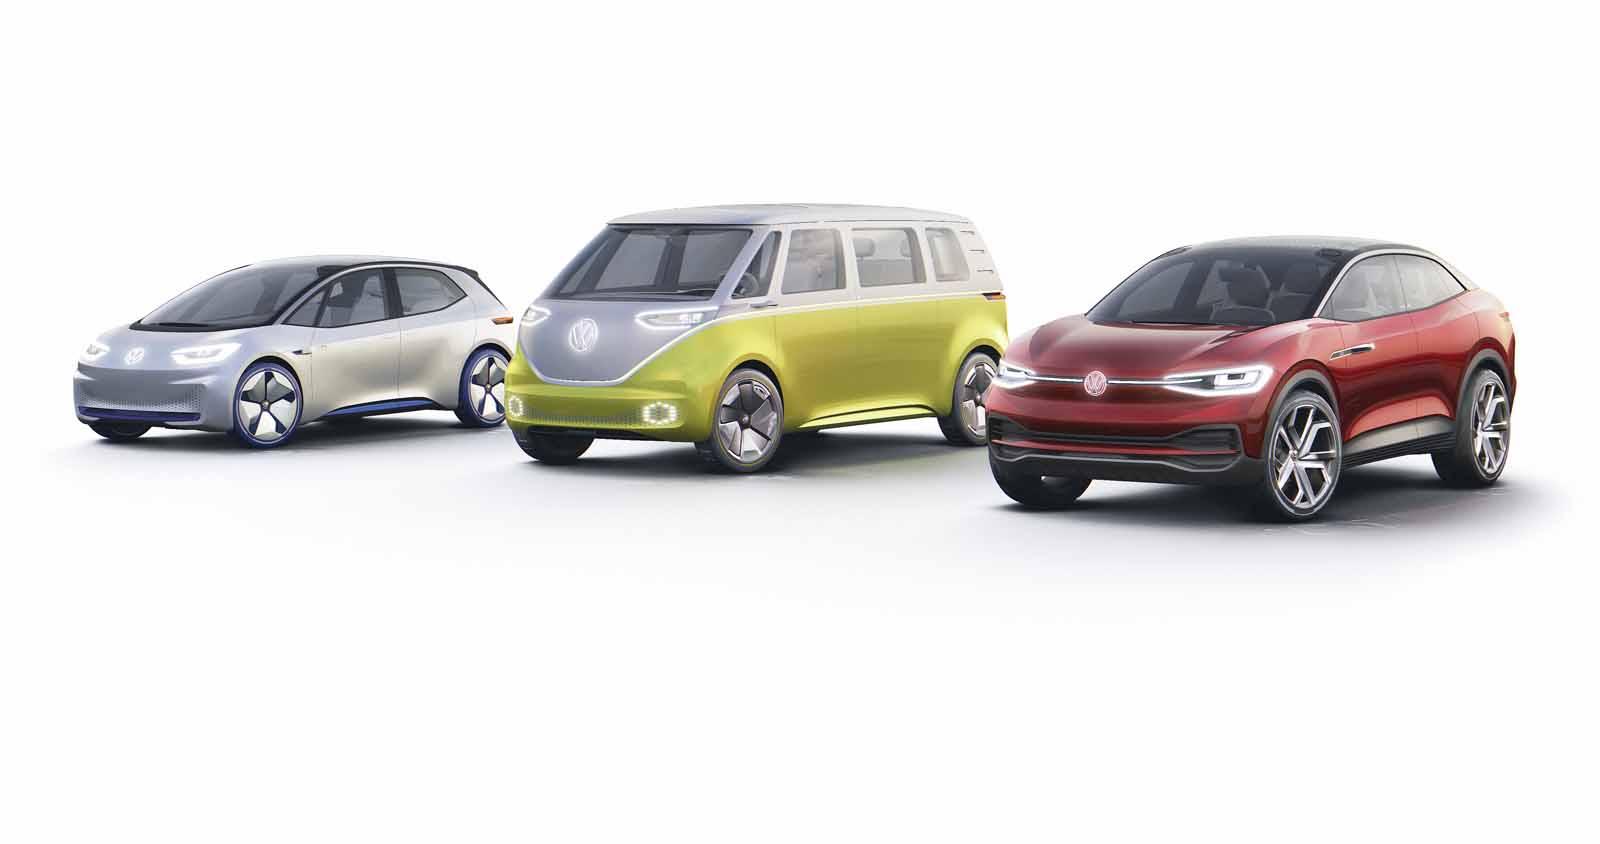 Die Volkswagen I.D. Familie